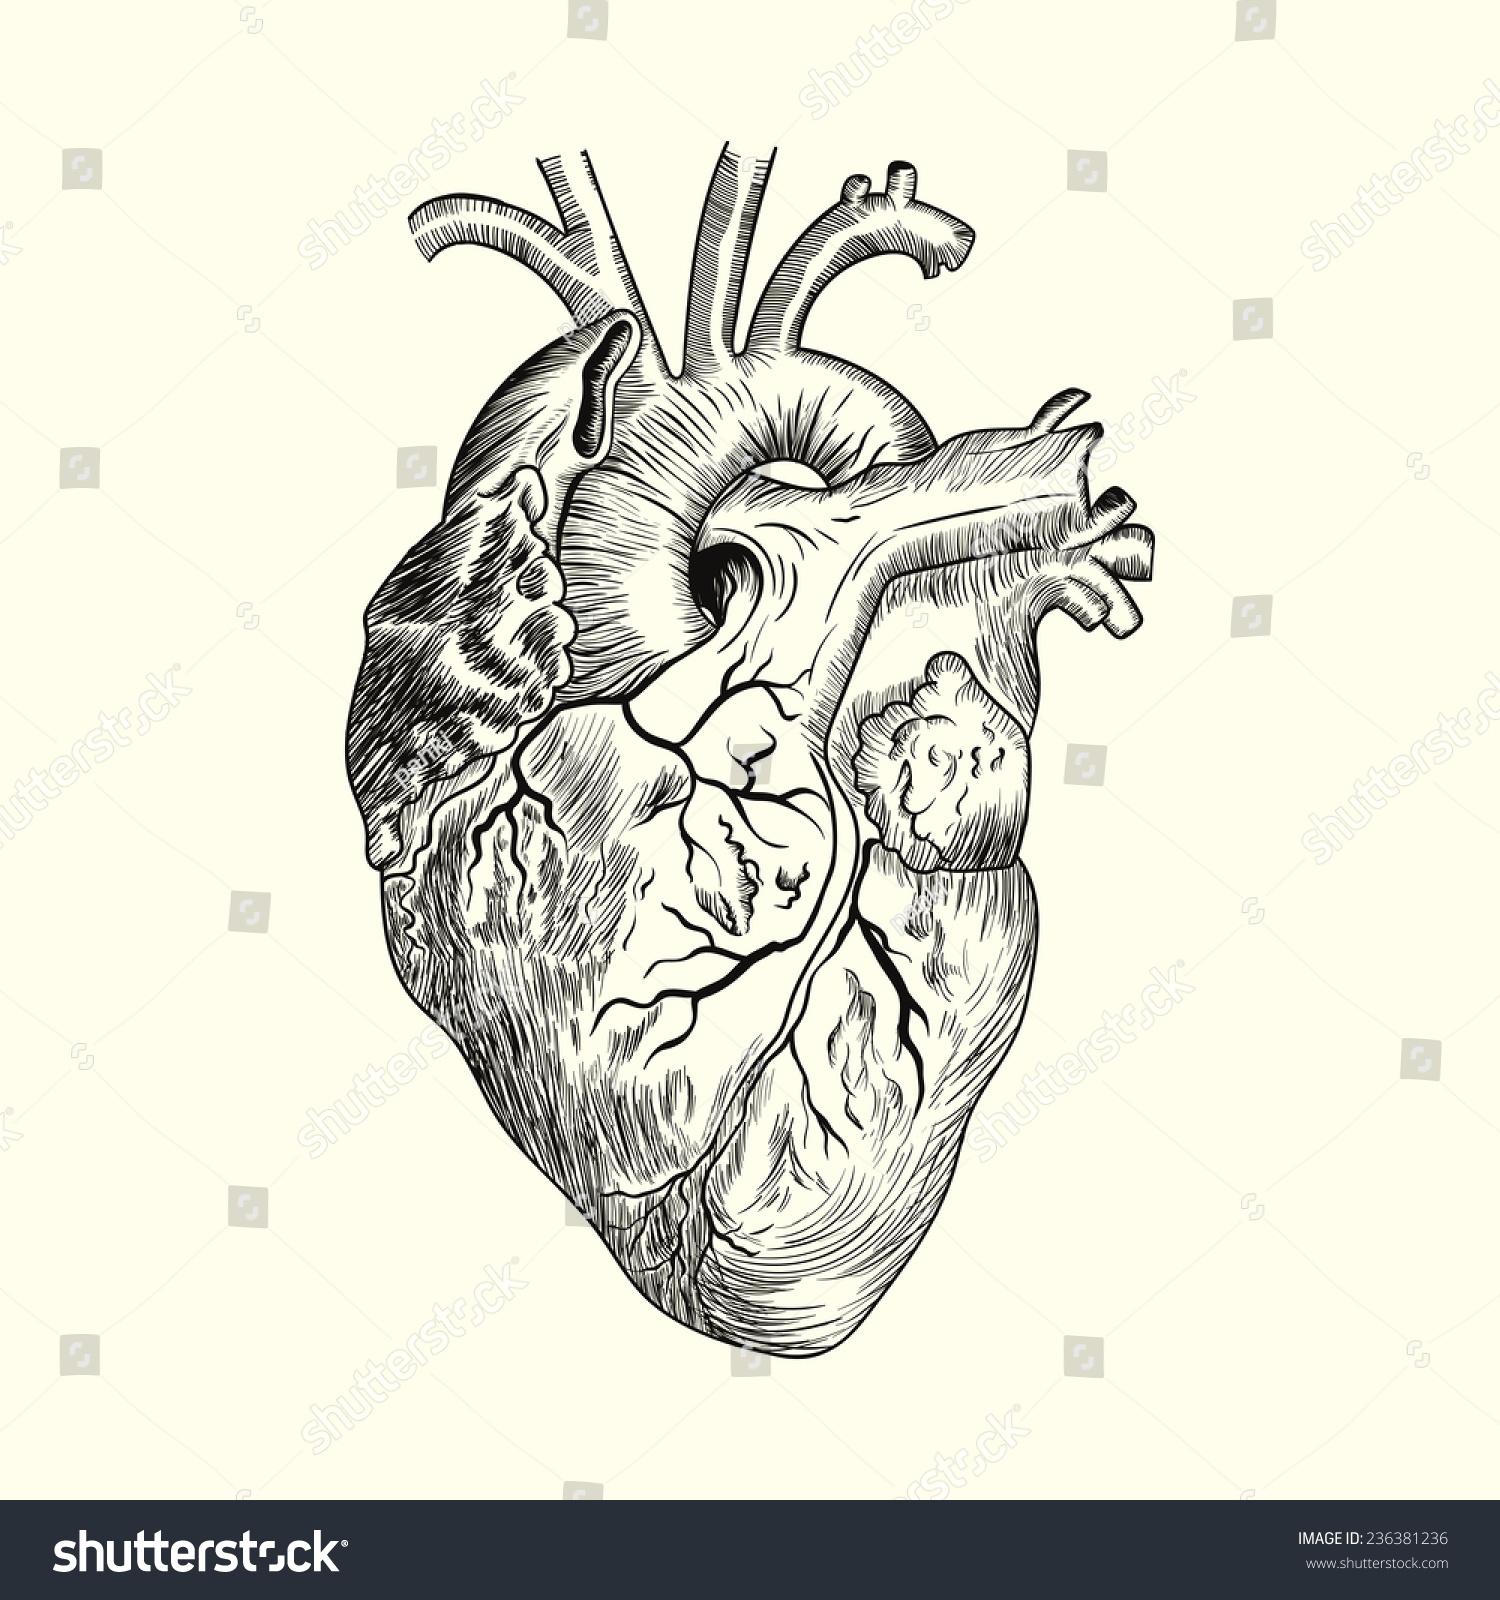 Hand Drawn Human Heart Sketch Anatomical Stock Vector Royalty Free